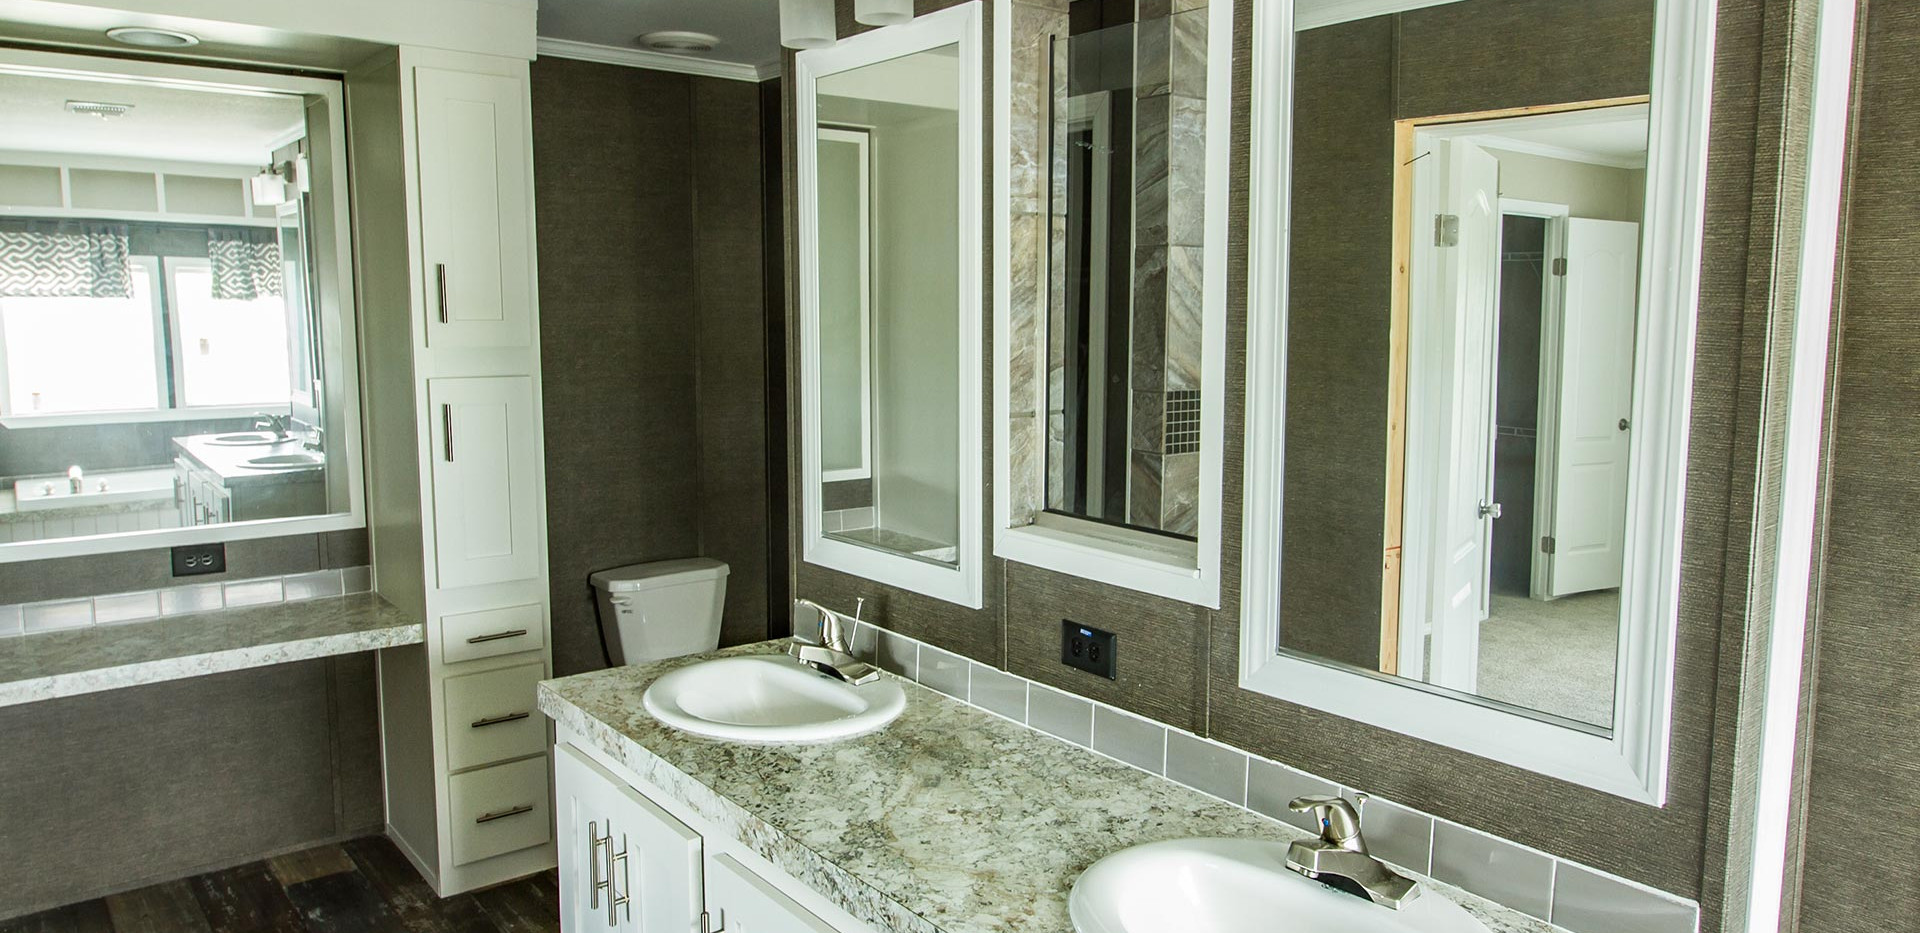 Fossil-Creek-The-Drake-bathroom-1.jpg